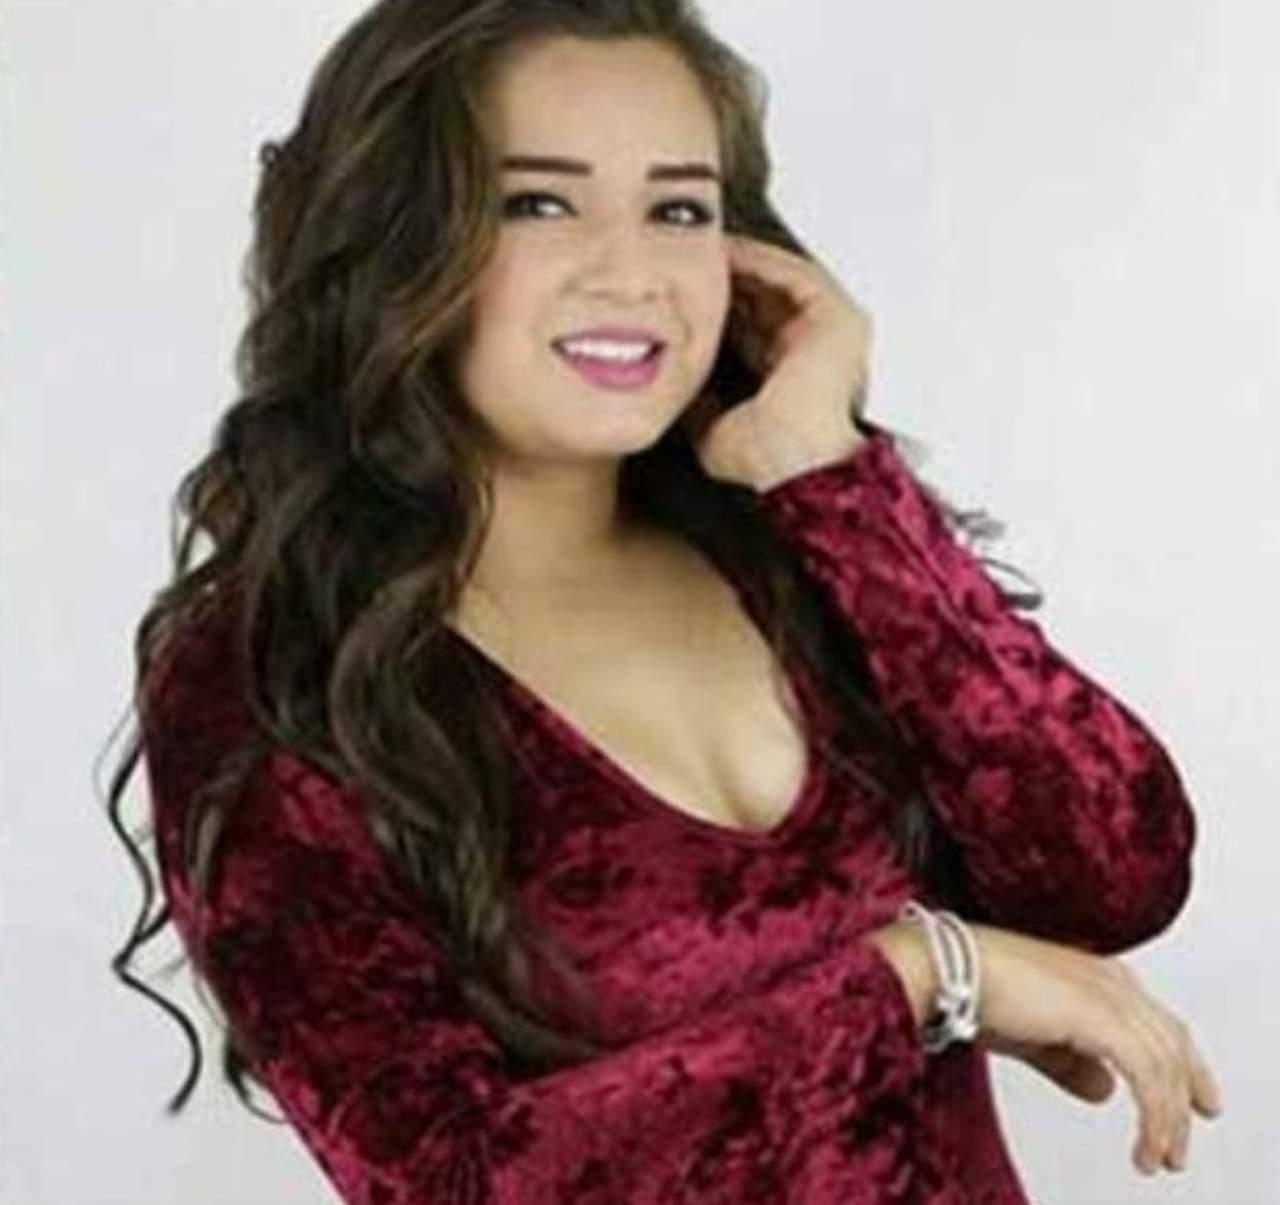 Localizan a candidata a Reina del Carnaval de Sinaloa